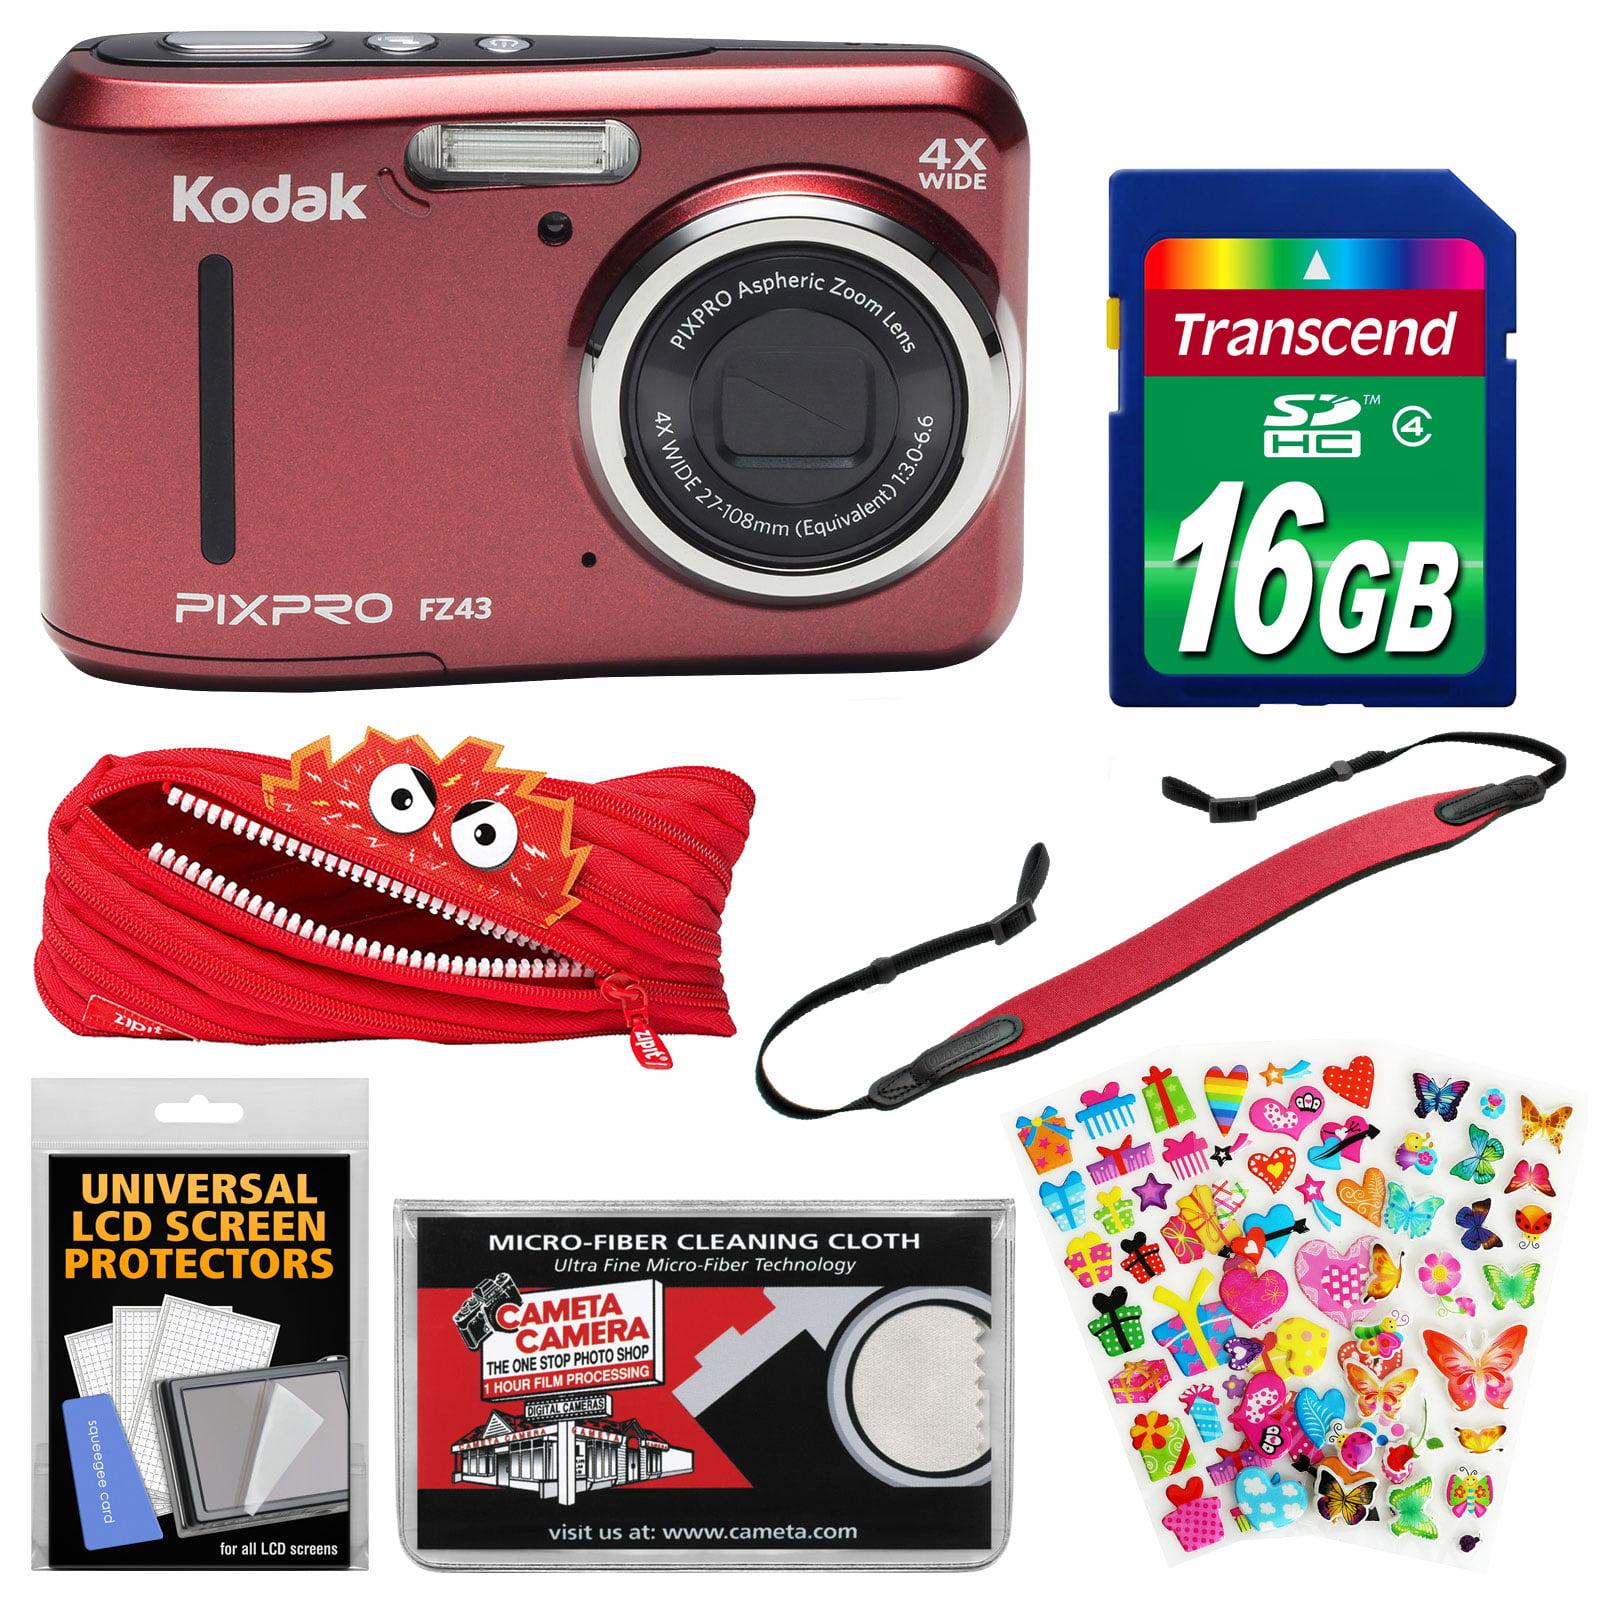 KODAK PIXPRO Friendly Zoom FZ43 Digital Camera (Red) with 16GB Card + Monstar Case + Strap + Puffy Stickers + Kit